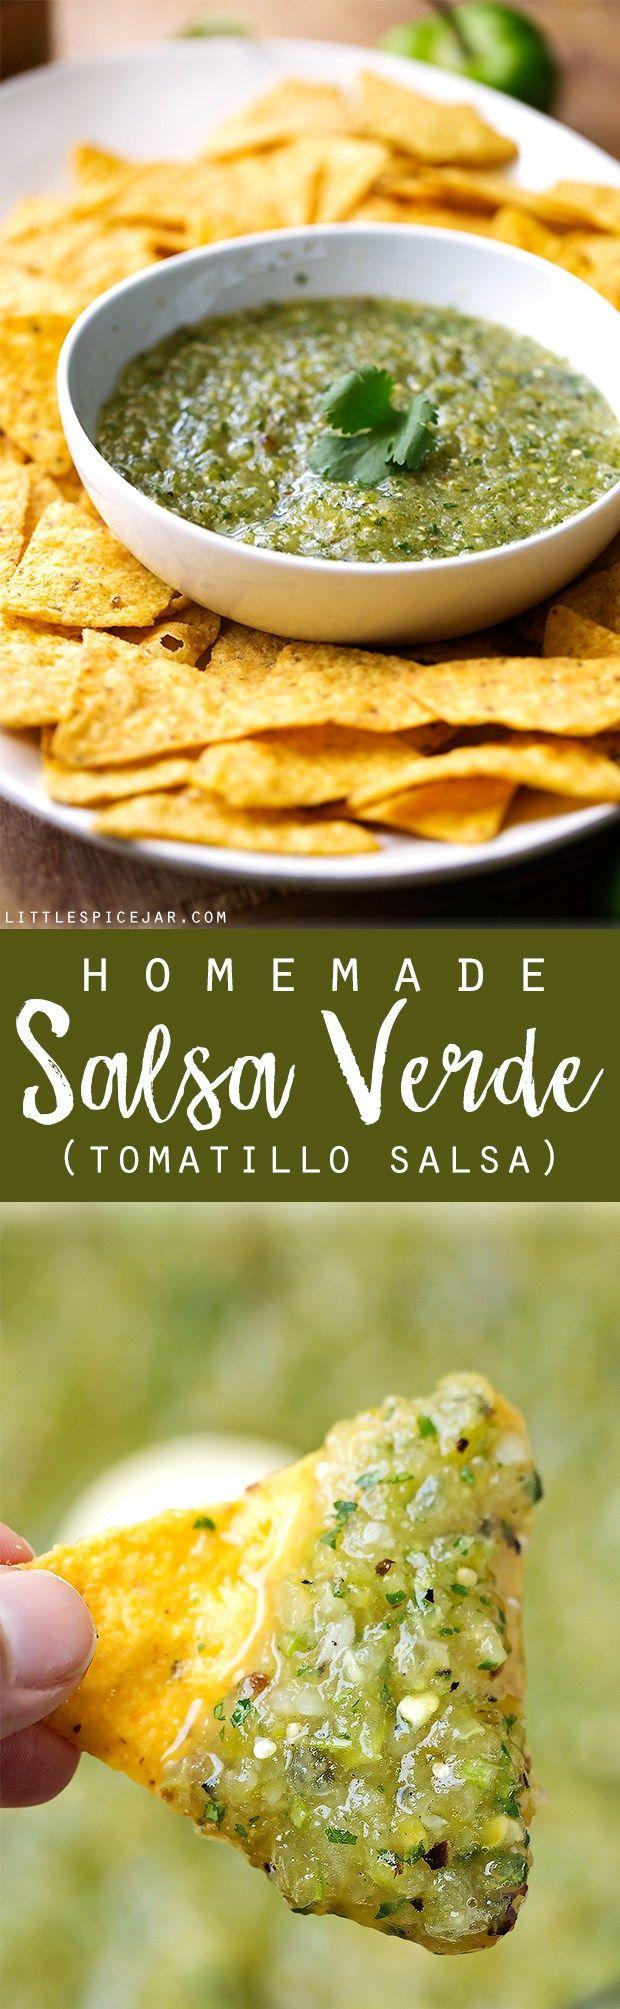 Tomatillos, Jalapenos, Cilantro, Onions, Garlic. Baby, you've got salsa verde! -- from LittleSpiceJar.com